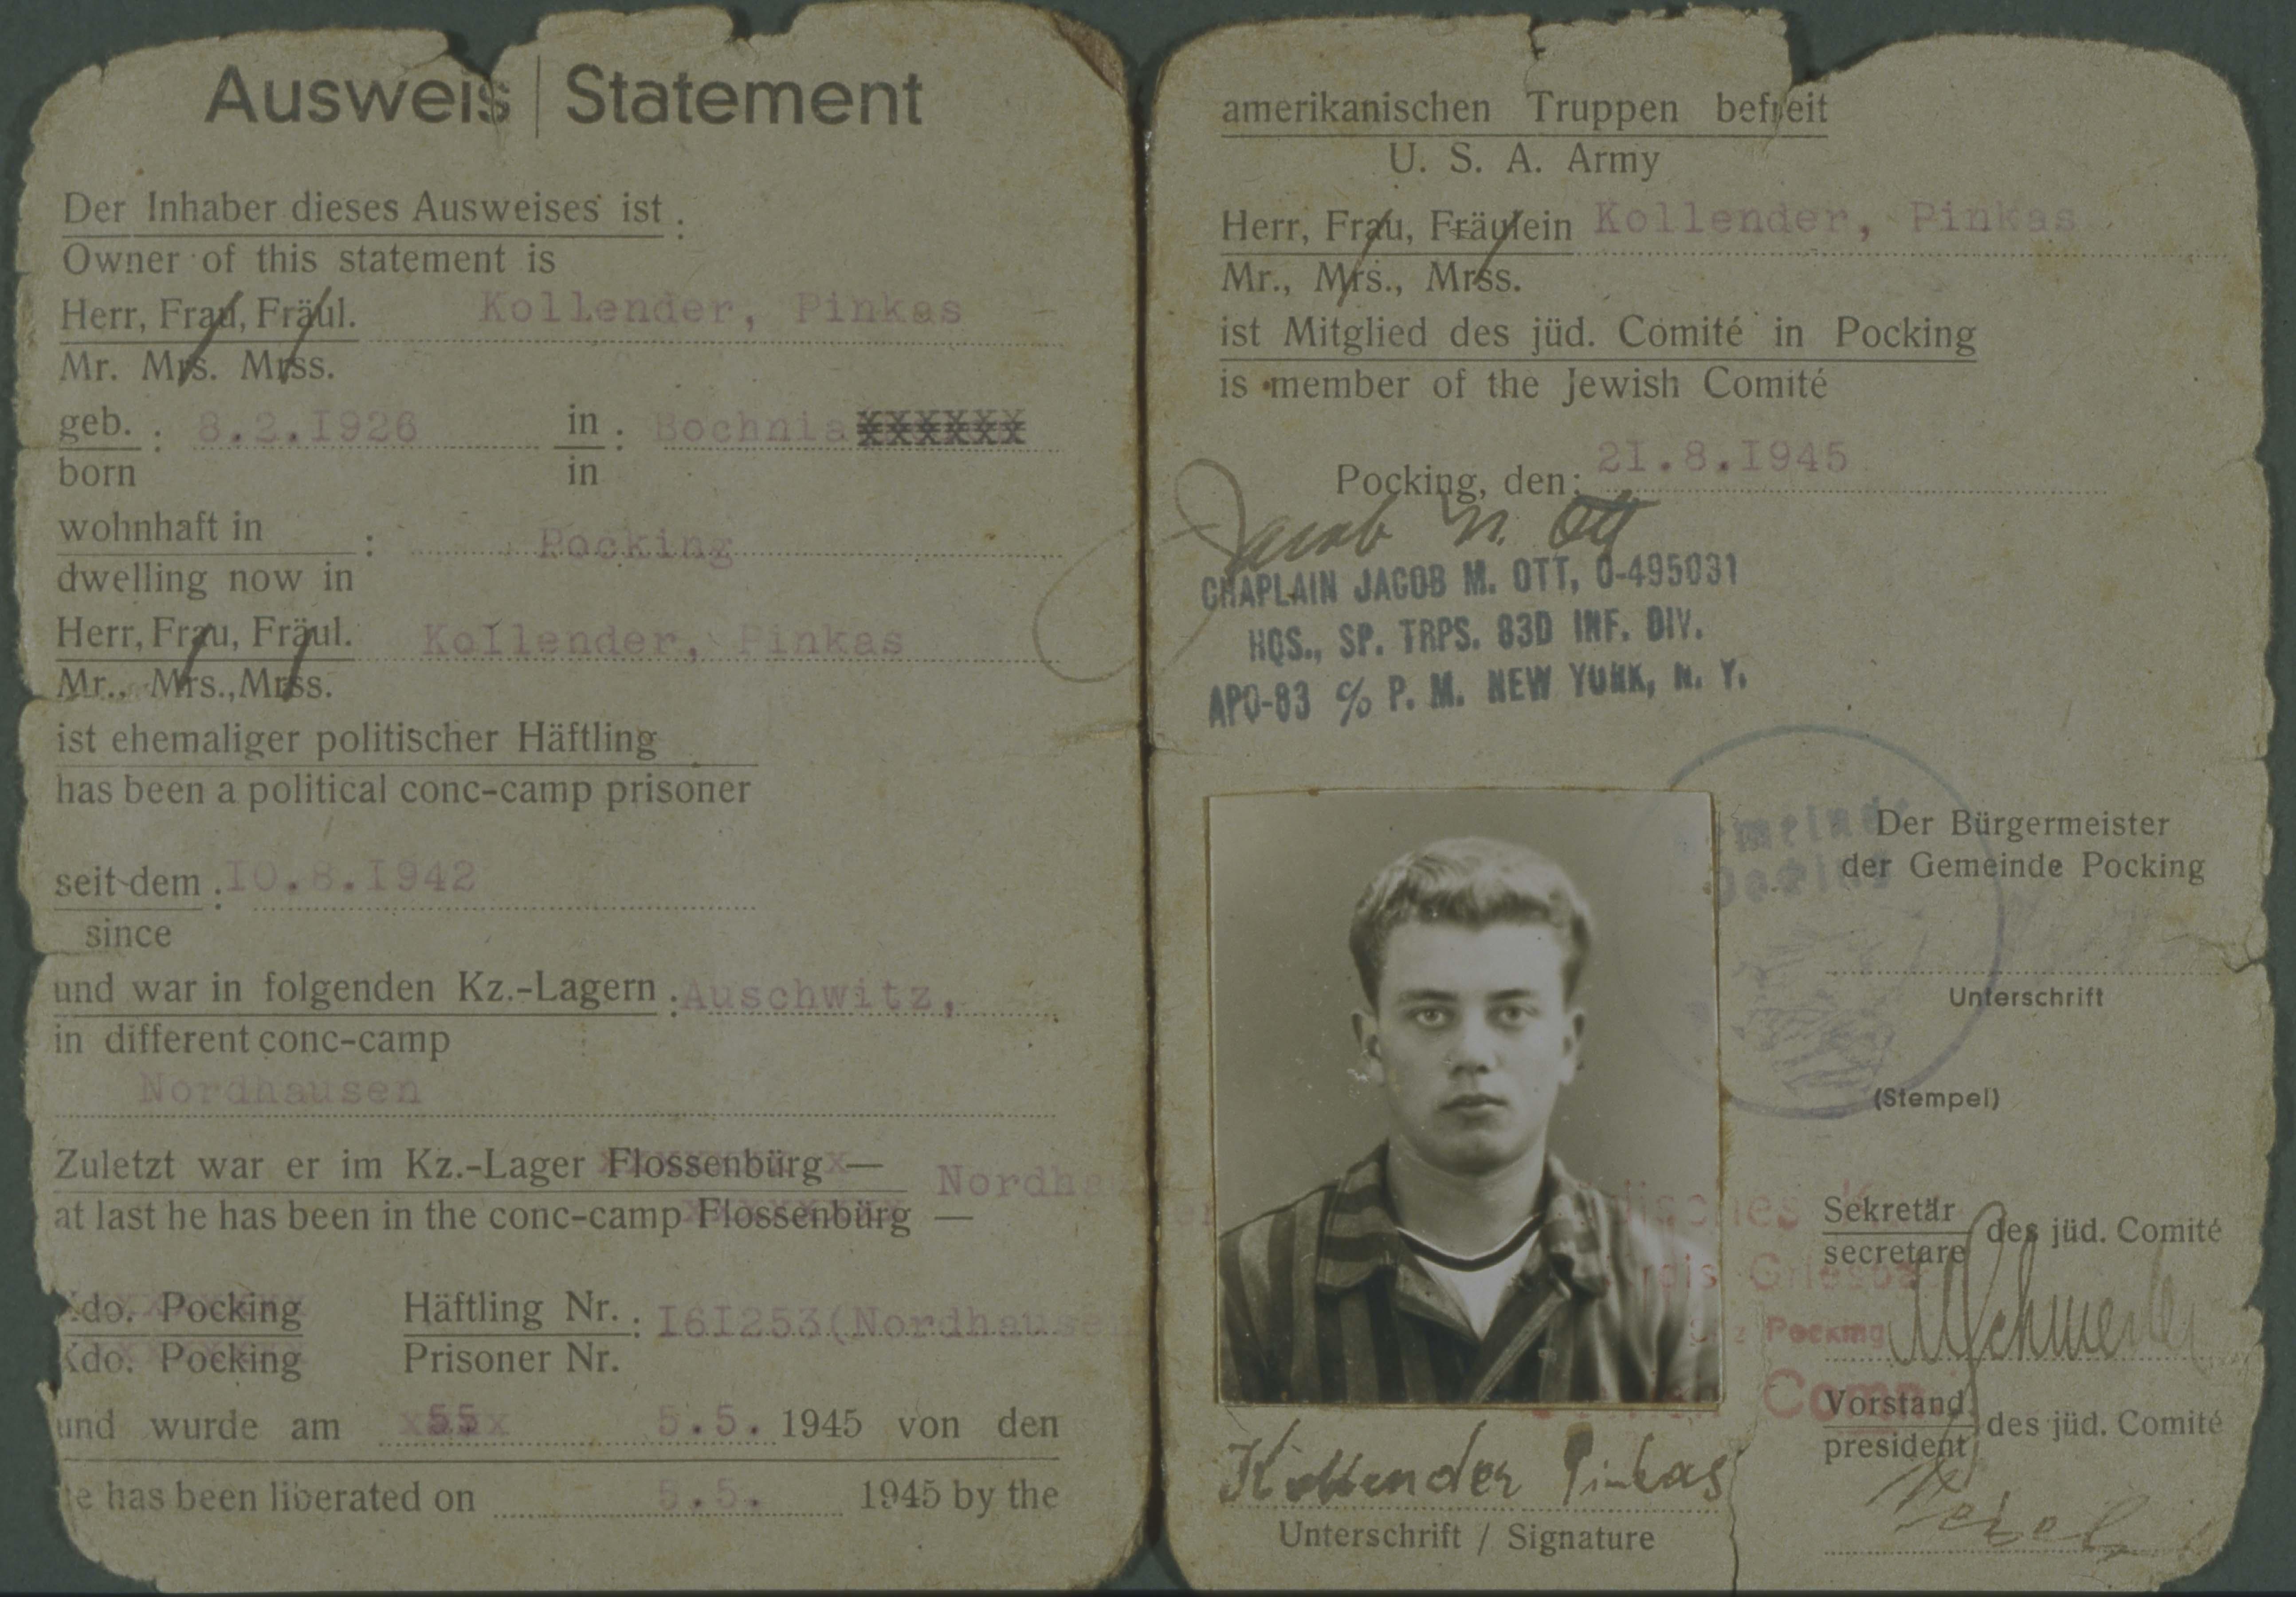 Pincus Kolender's ID card, Pocking, Germany 1945